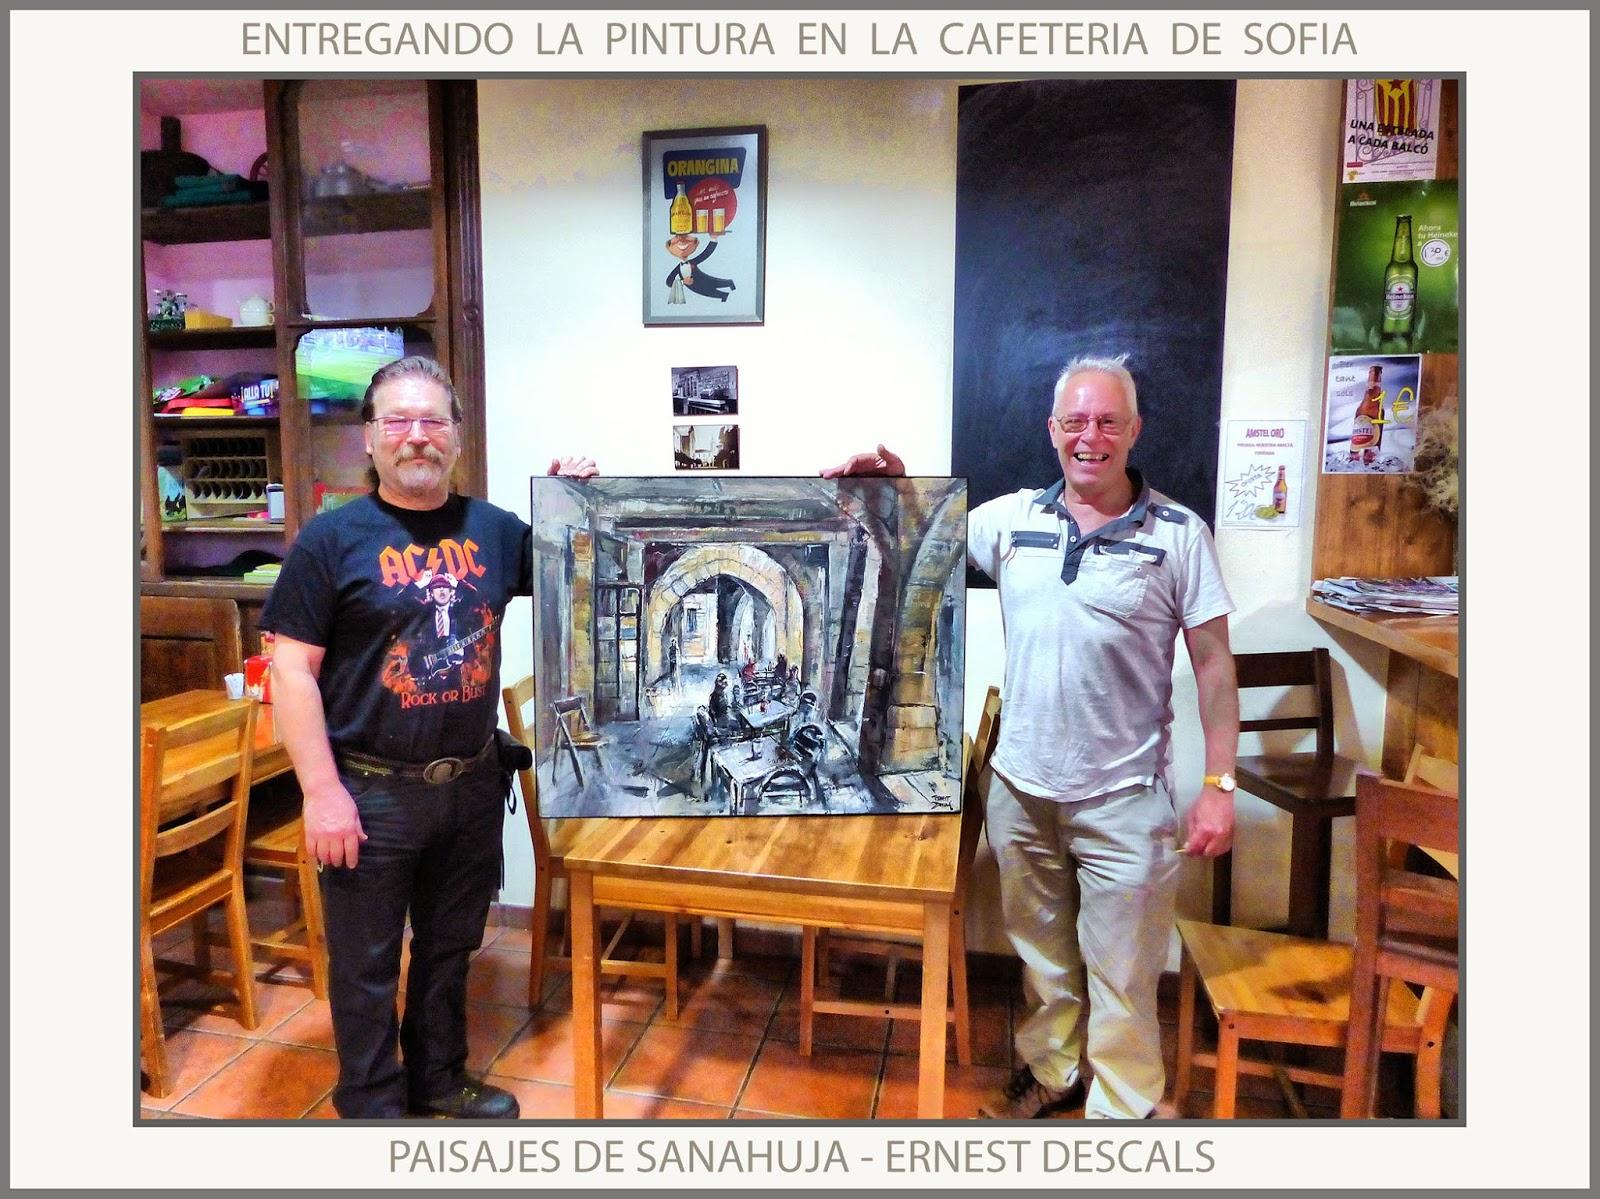 Ernest Descals Artista Pintor Sanahuja Pintura Cafeteria